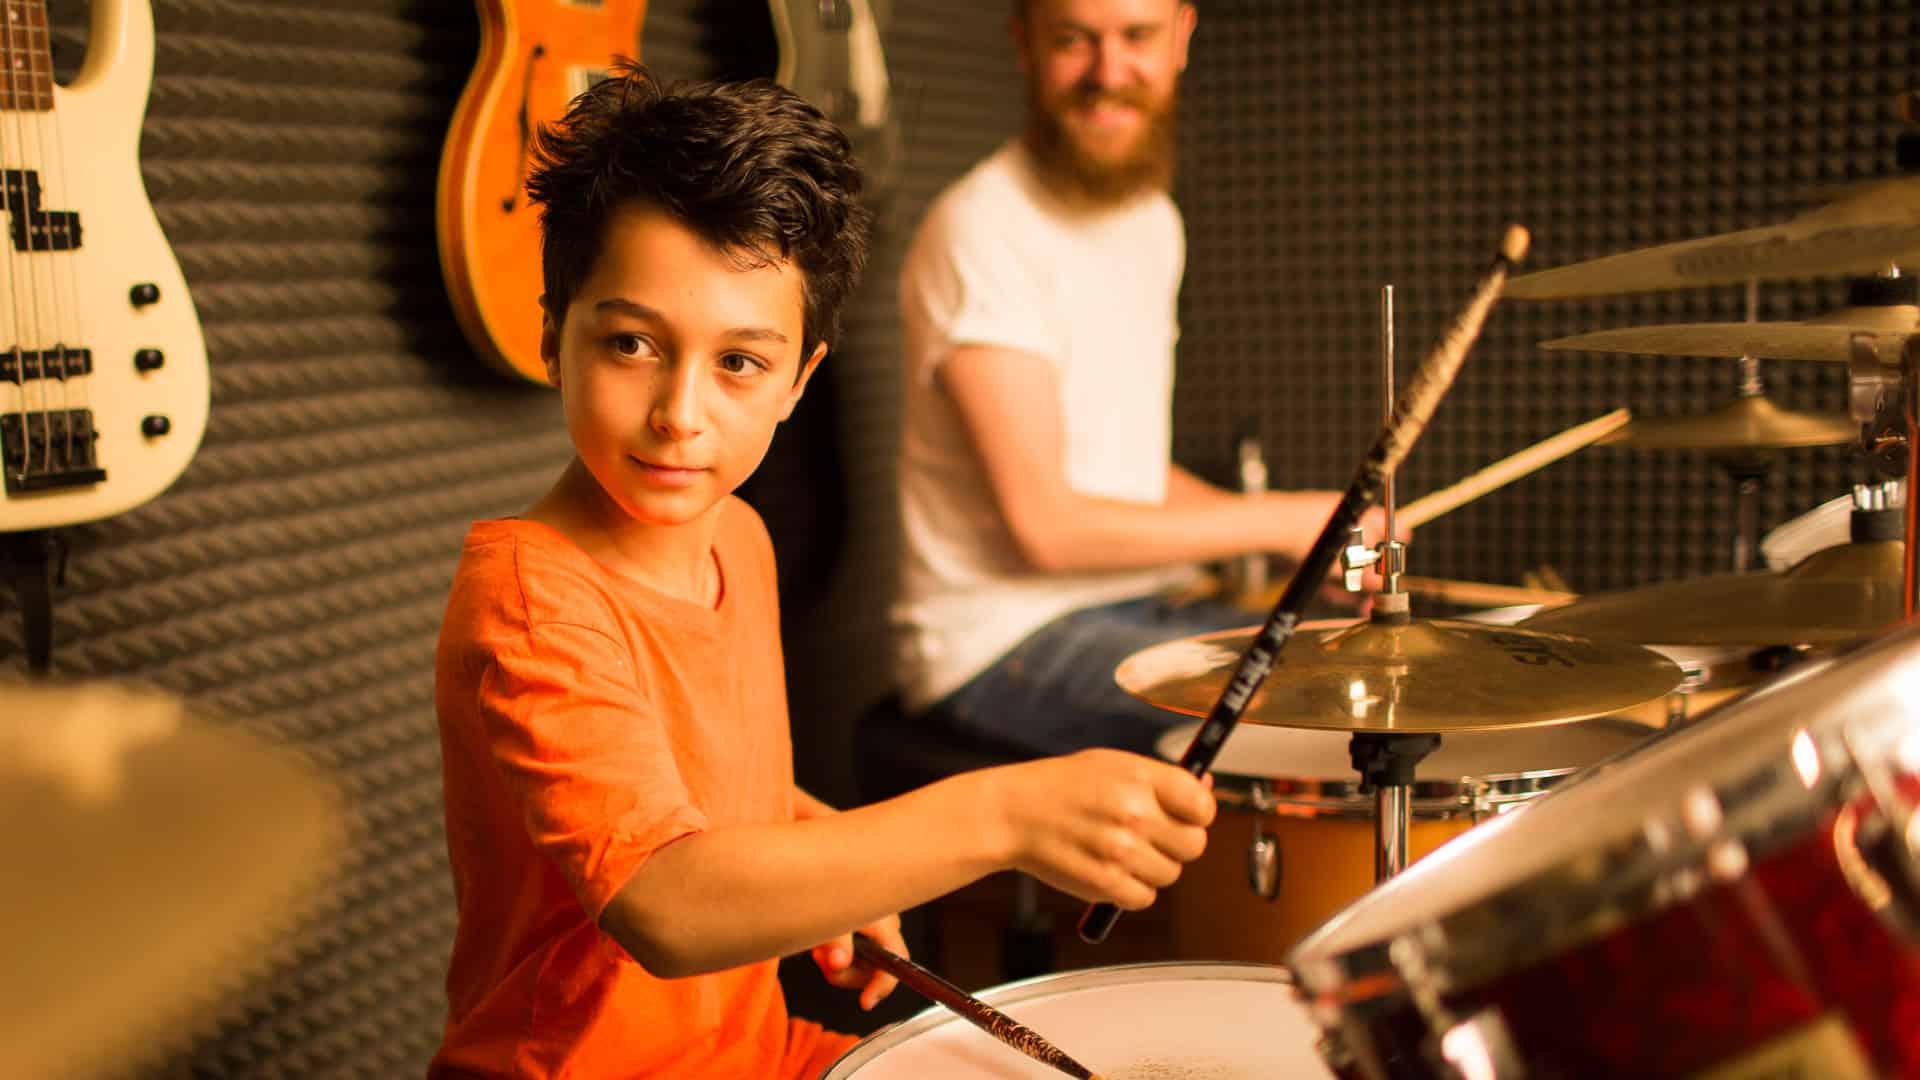 Sam-and-kid-2-drum-kits-edit.jpg